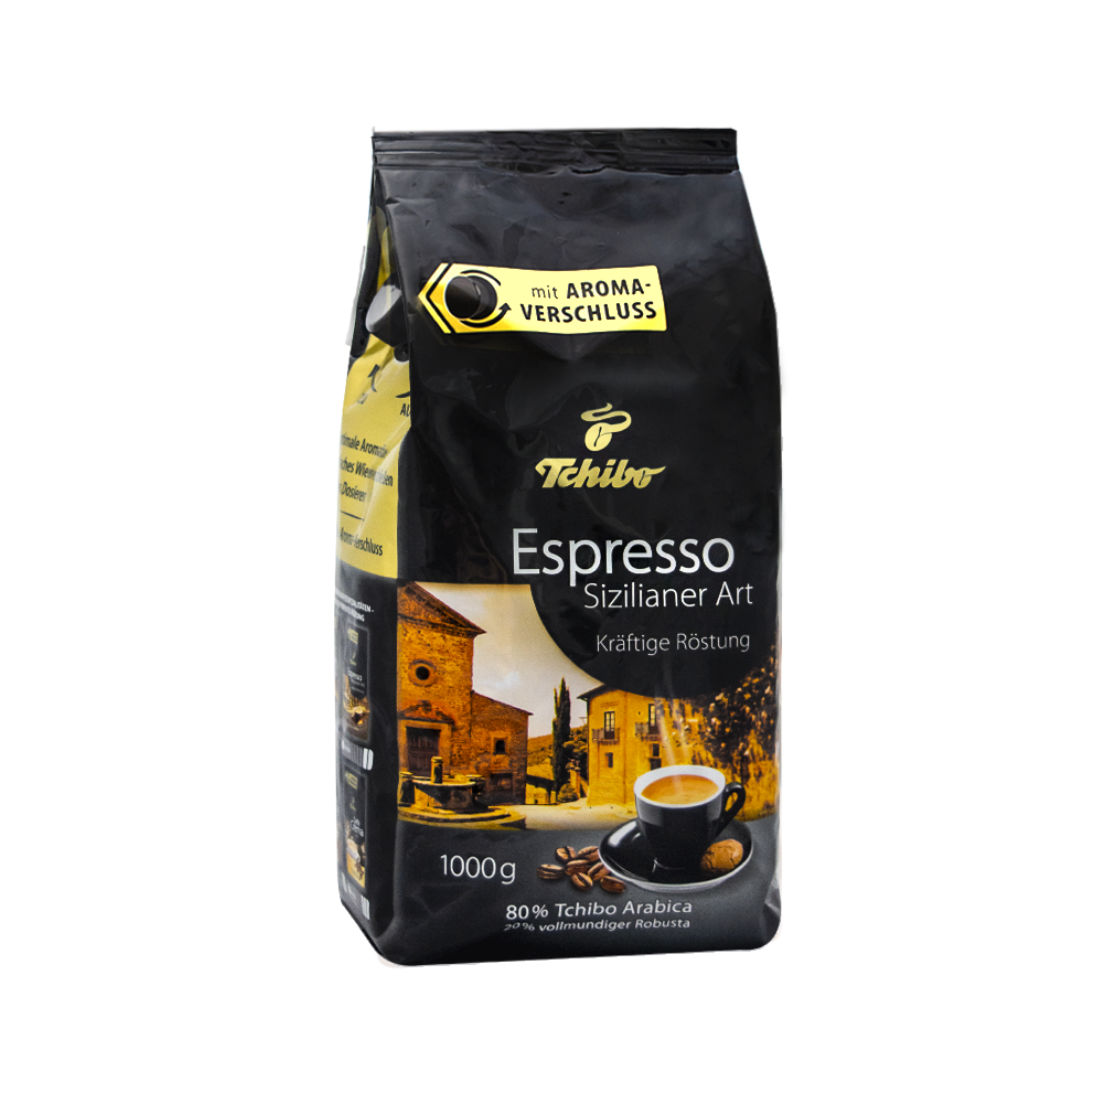 kawa ziarnista Tchibo Espresso Sizilianer Art